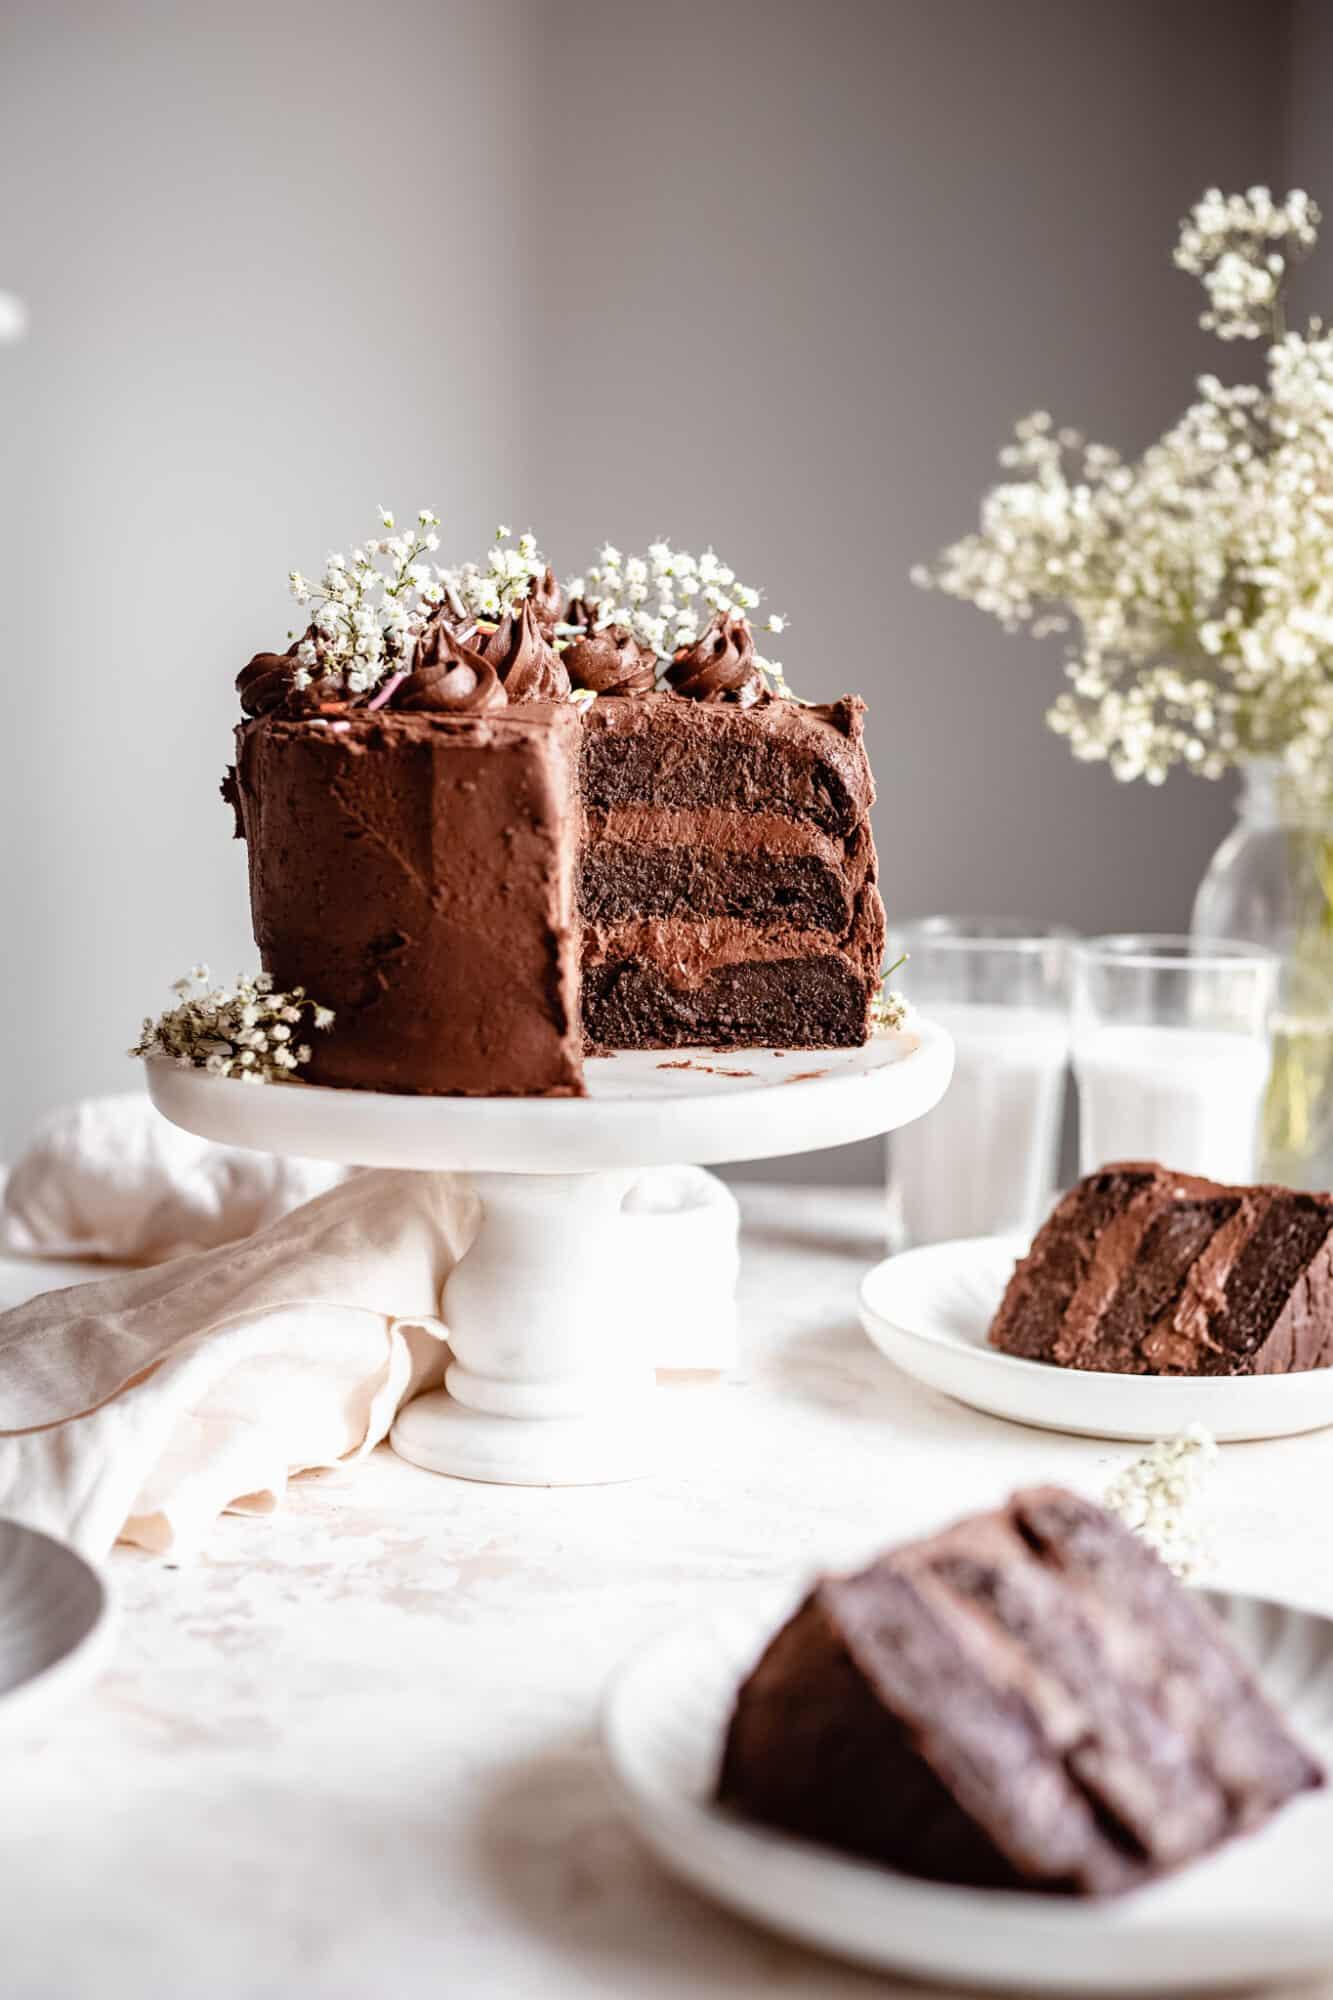 slices of chocolate cake near zucchini cake